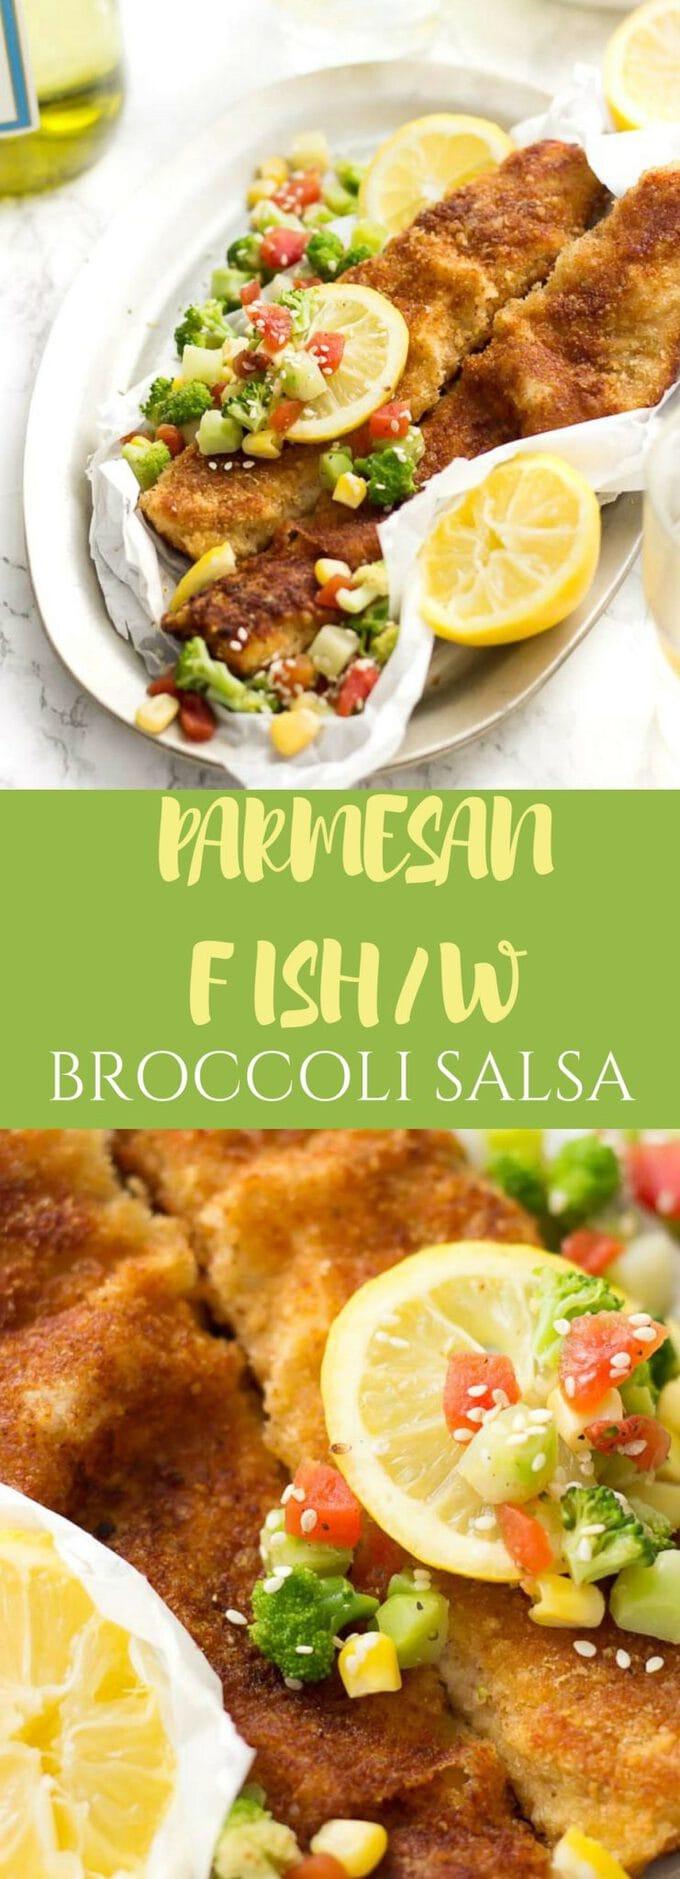 Parmesan Fish With Broccoli, Corn and Tomato Salsa